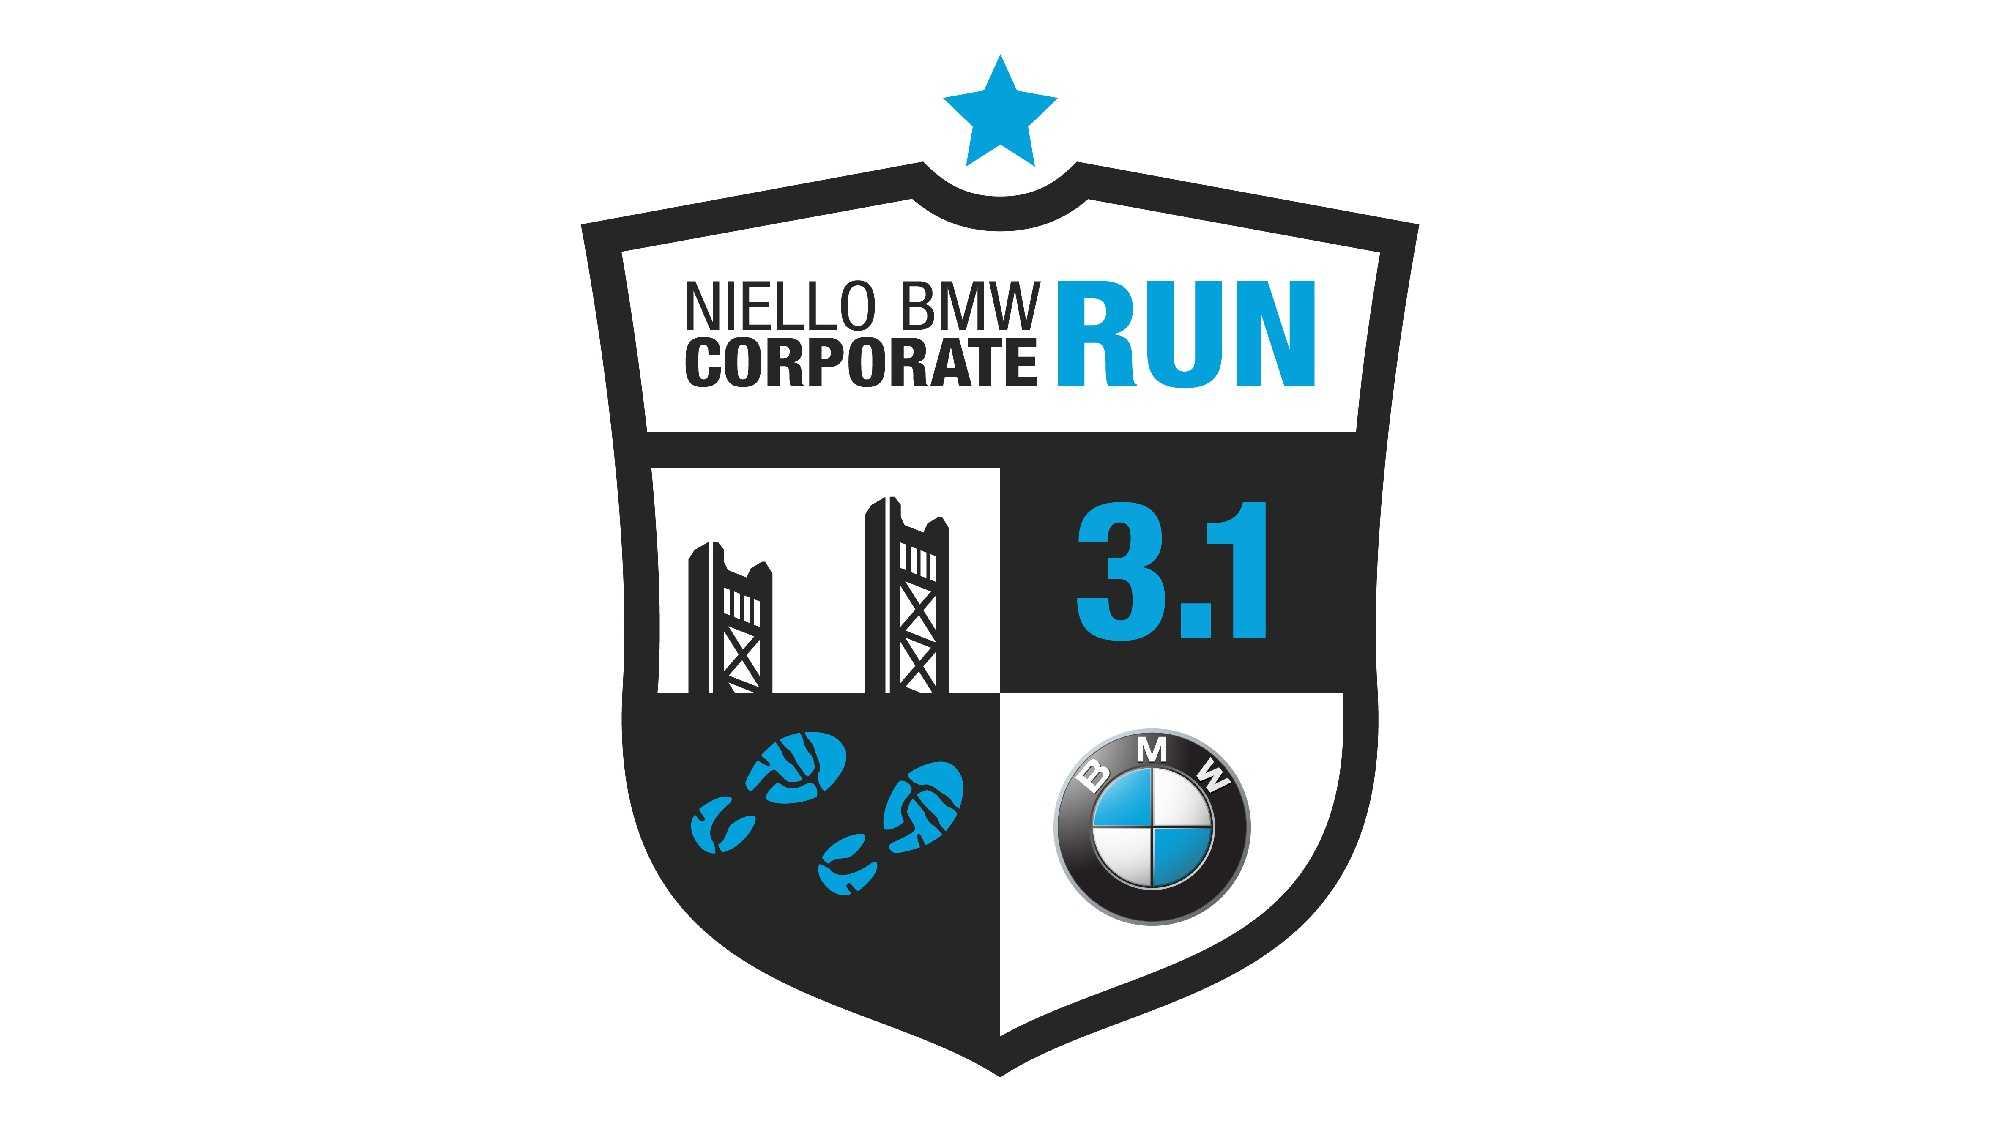 Corporate Run logo